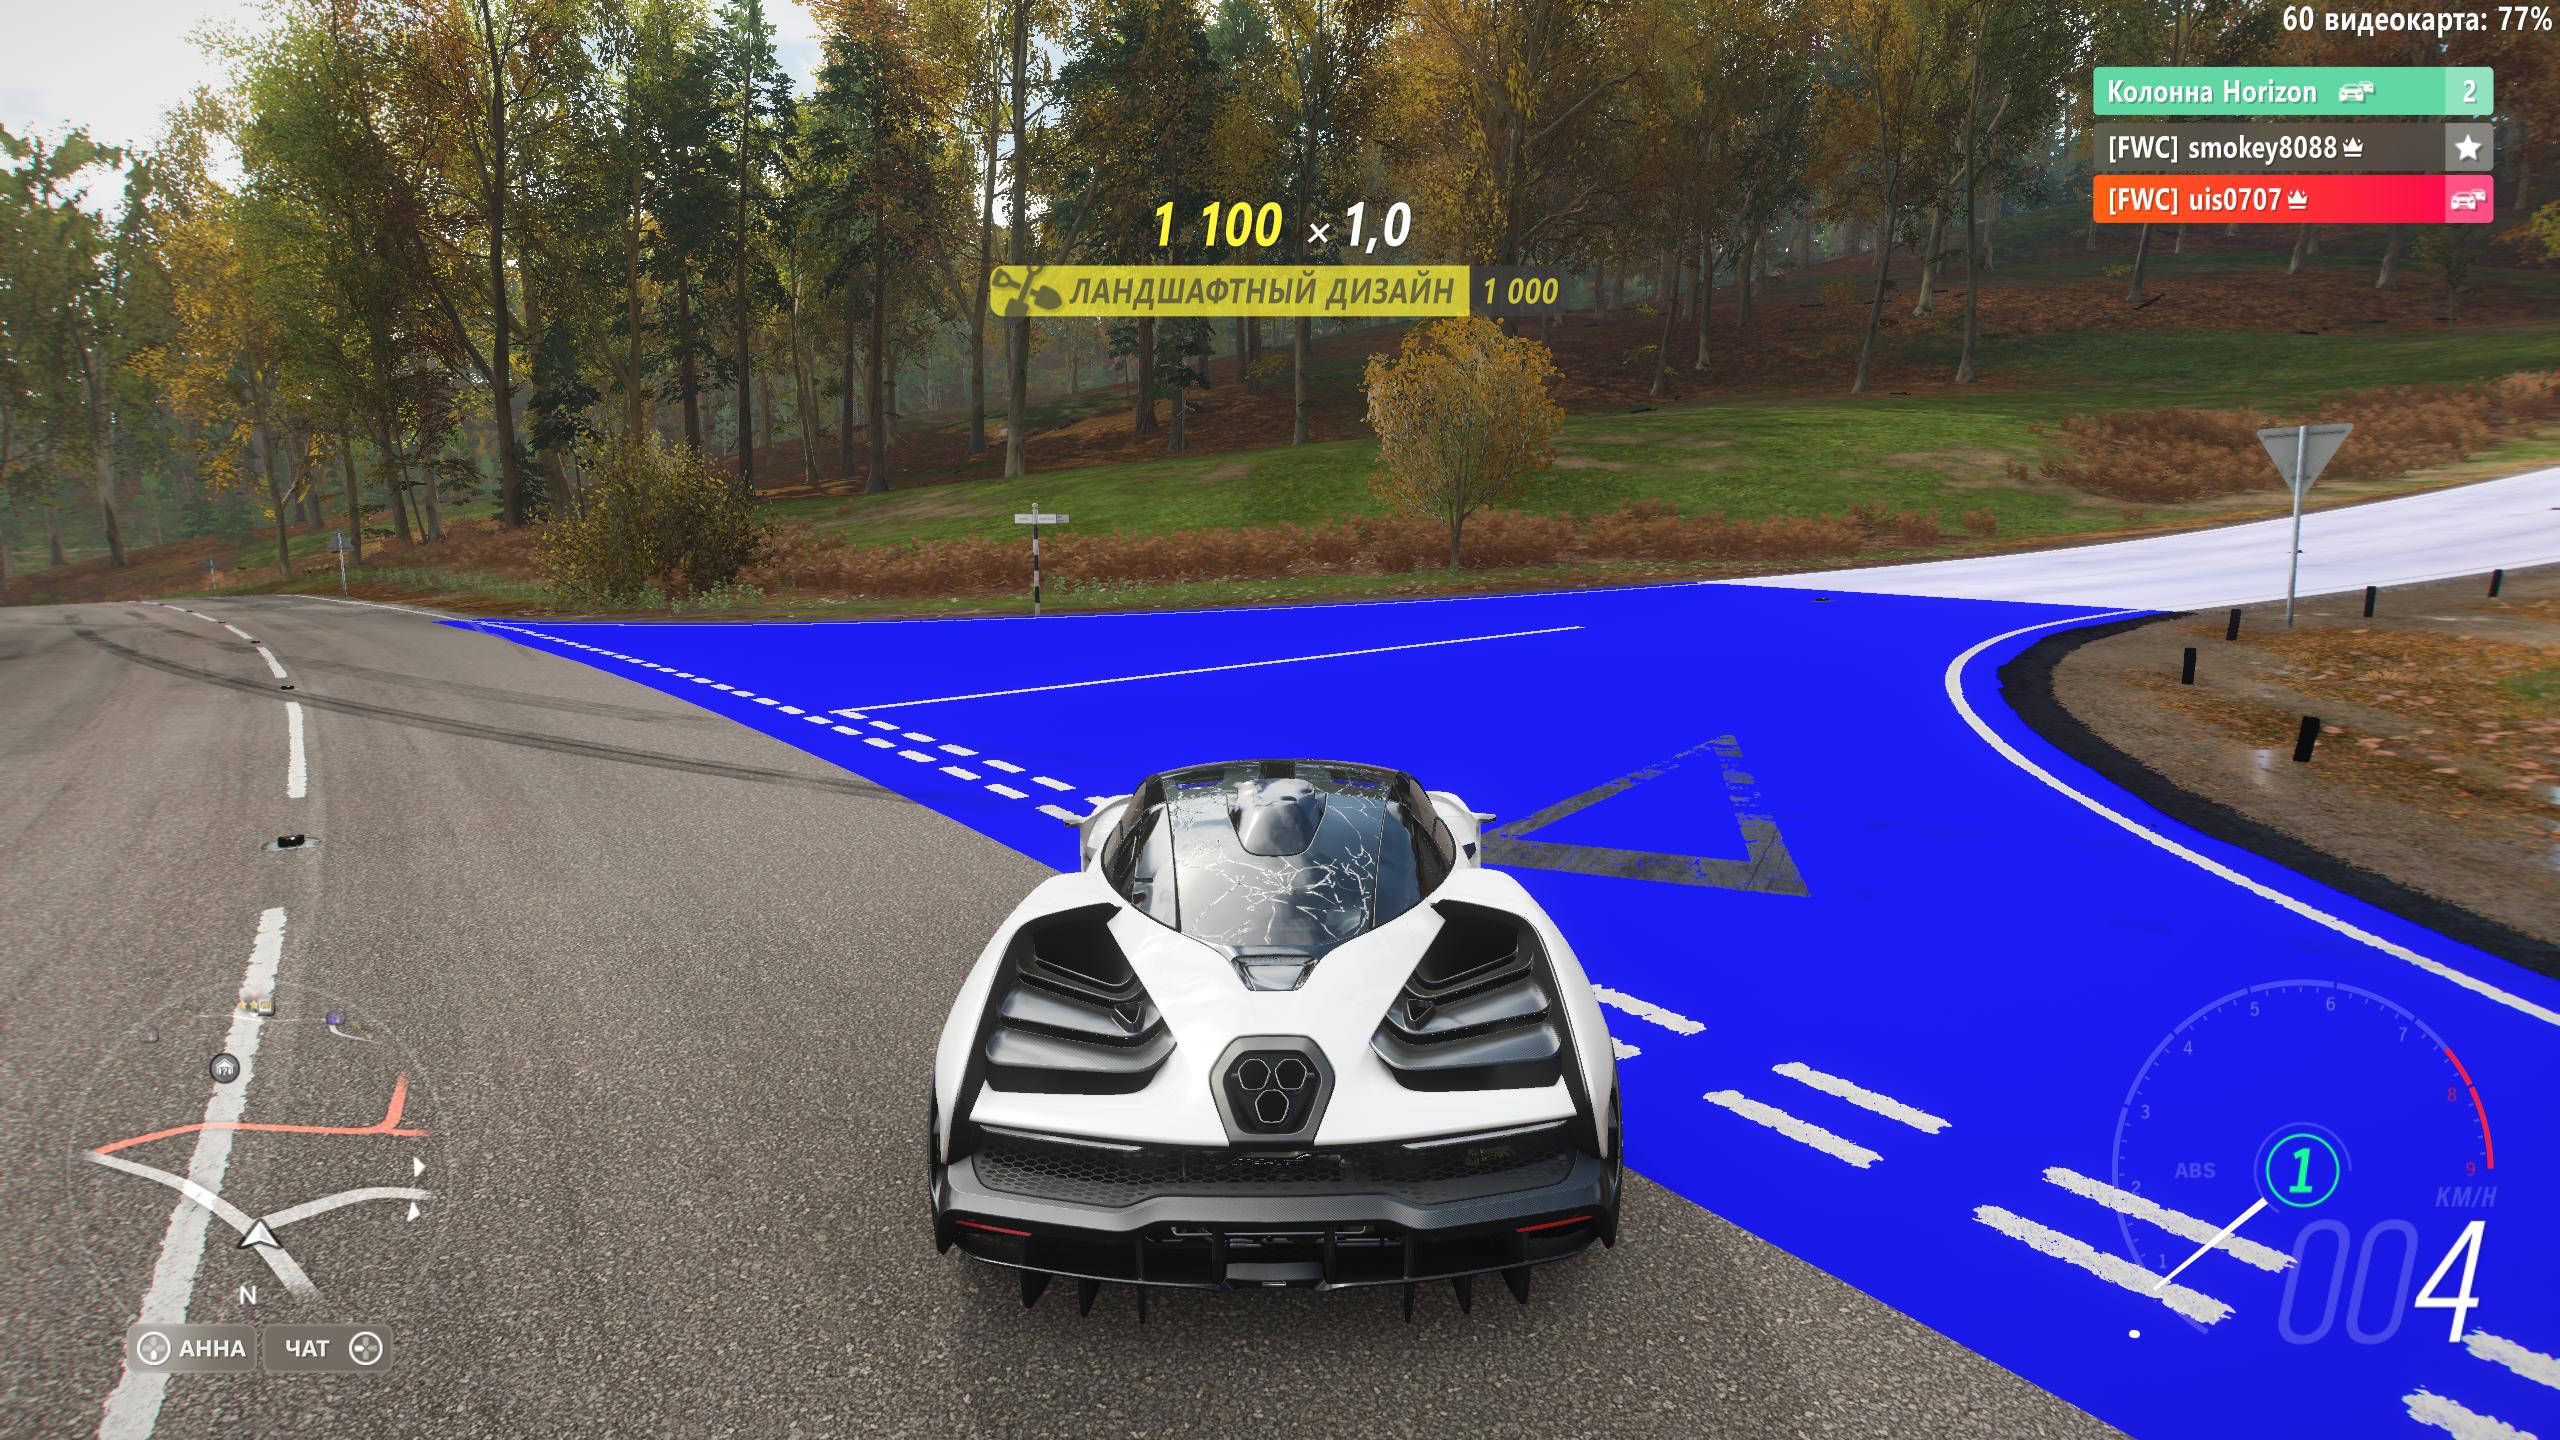 Словил баг - Forza Horizon 4